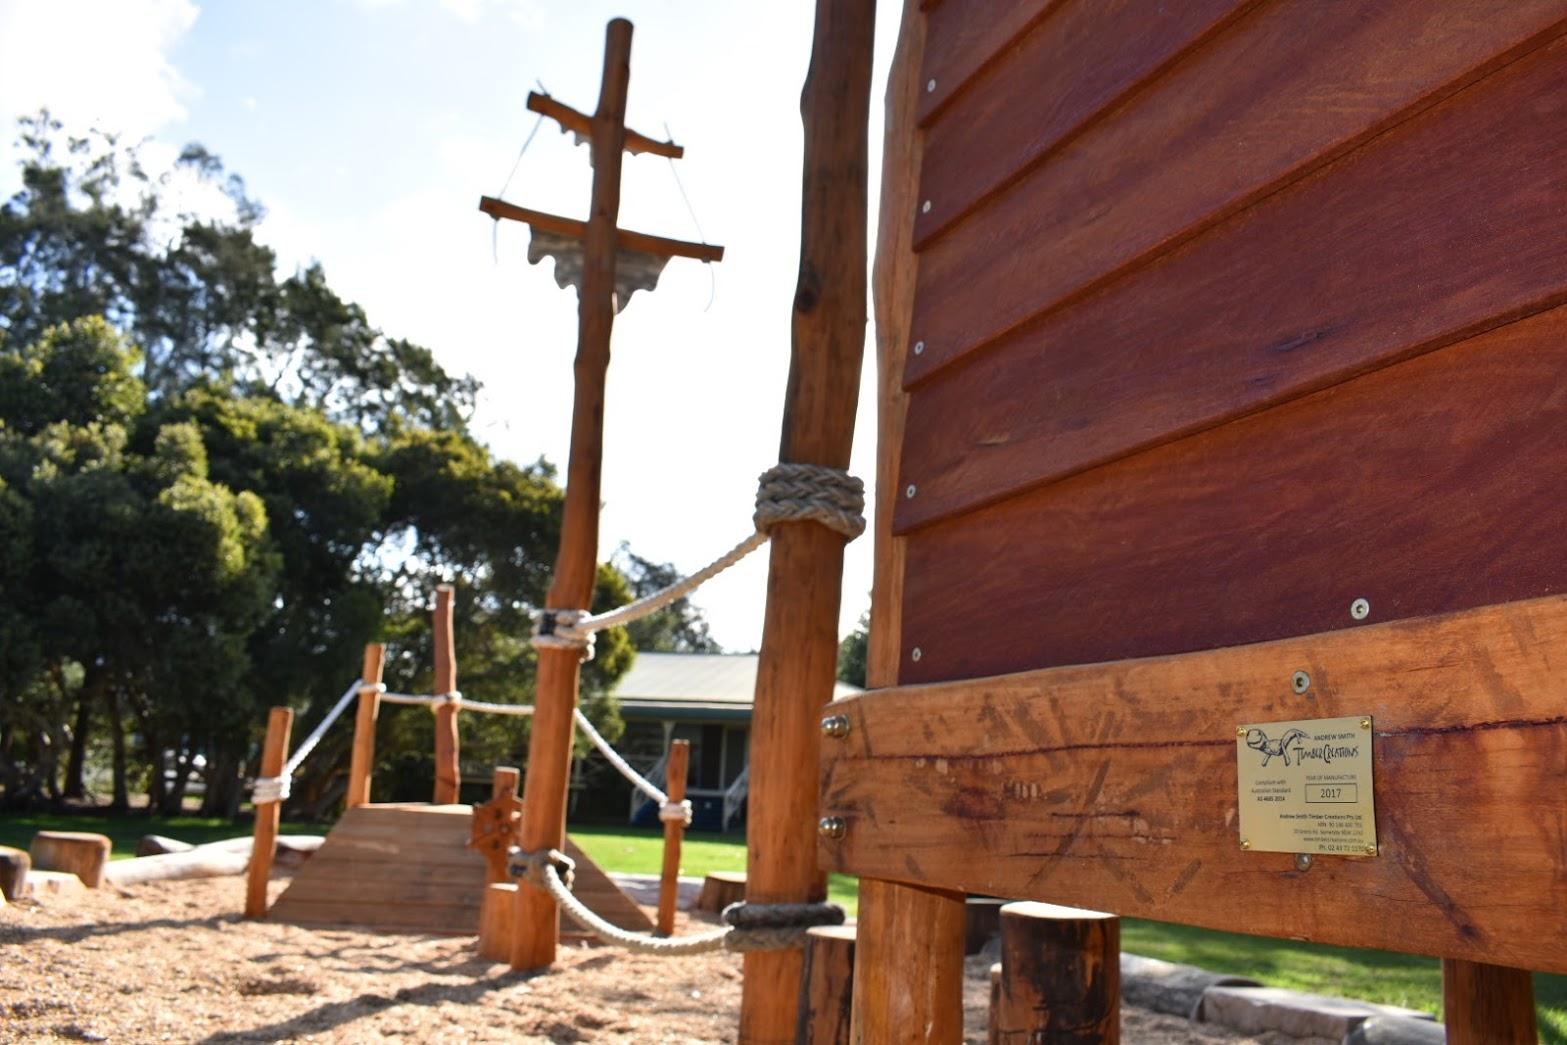 Terrigal Ship Playground